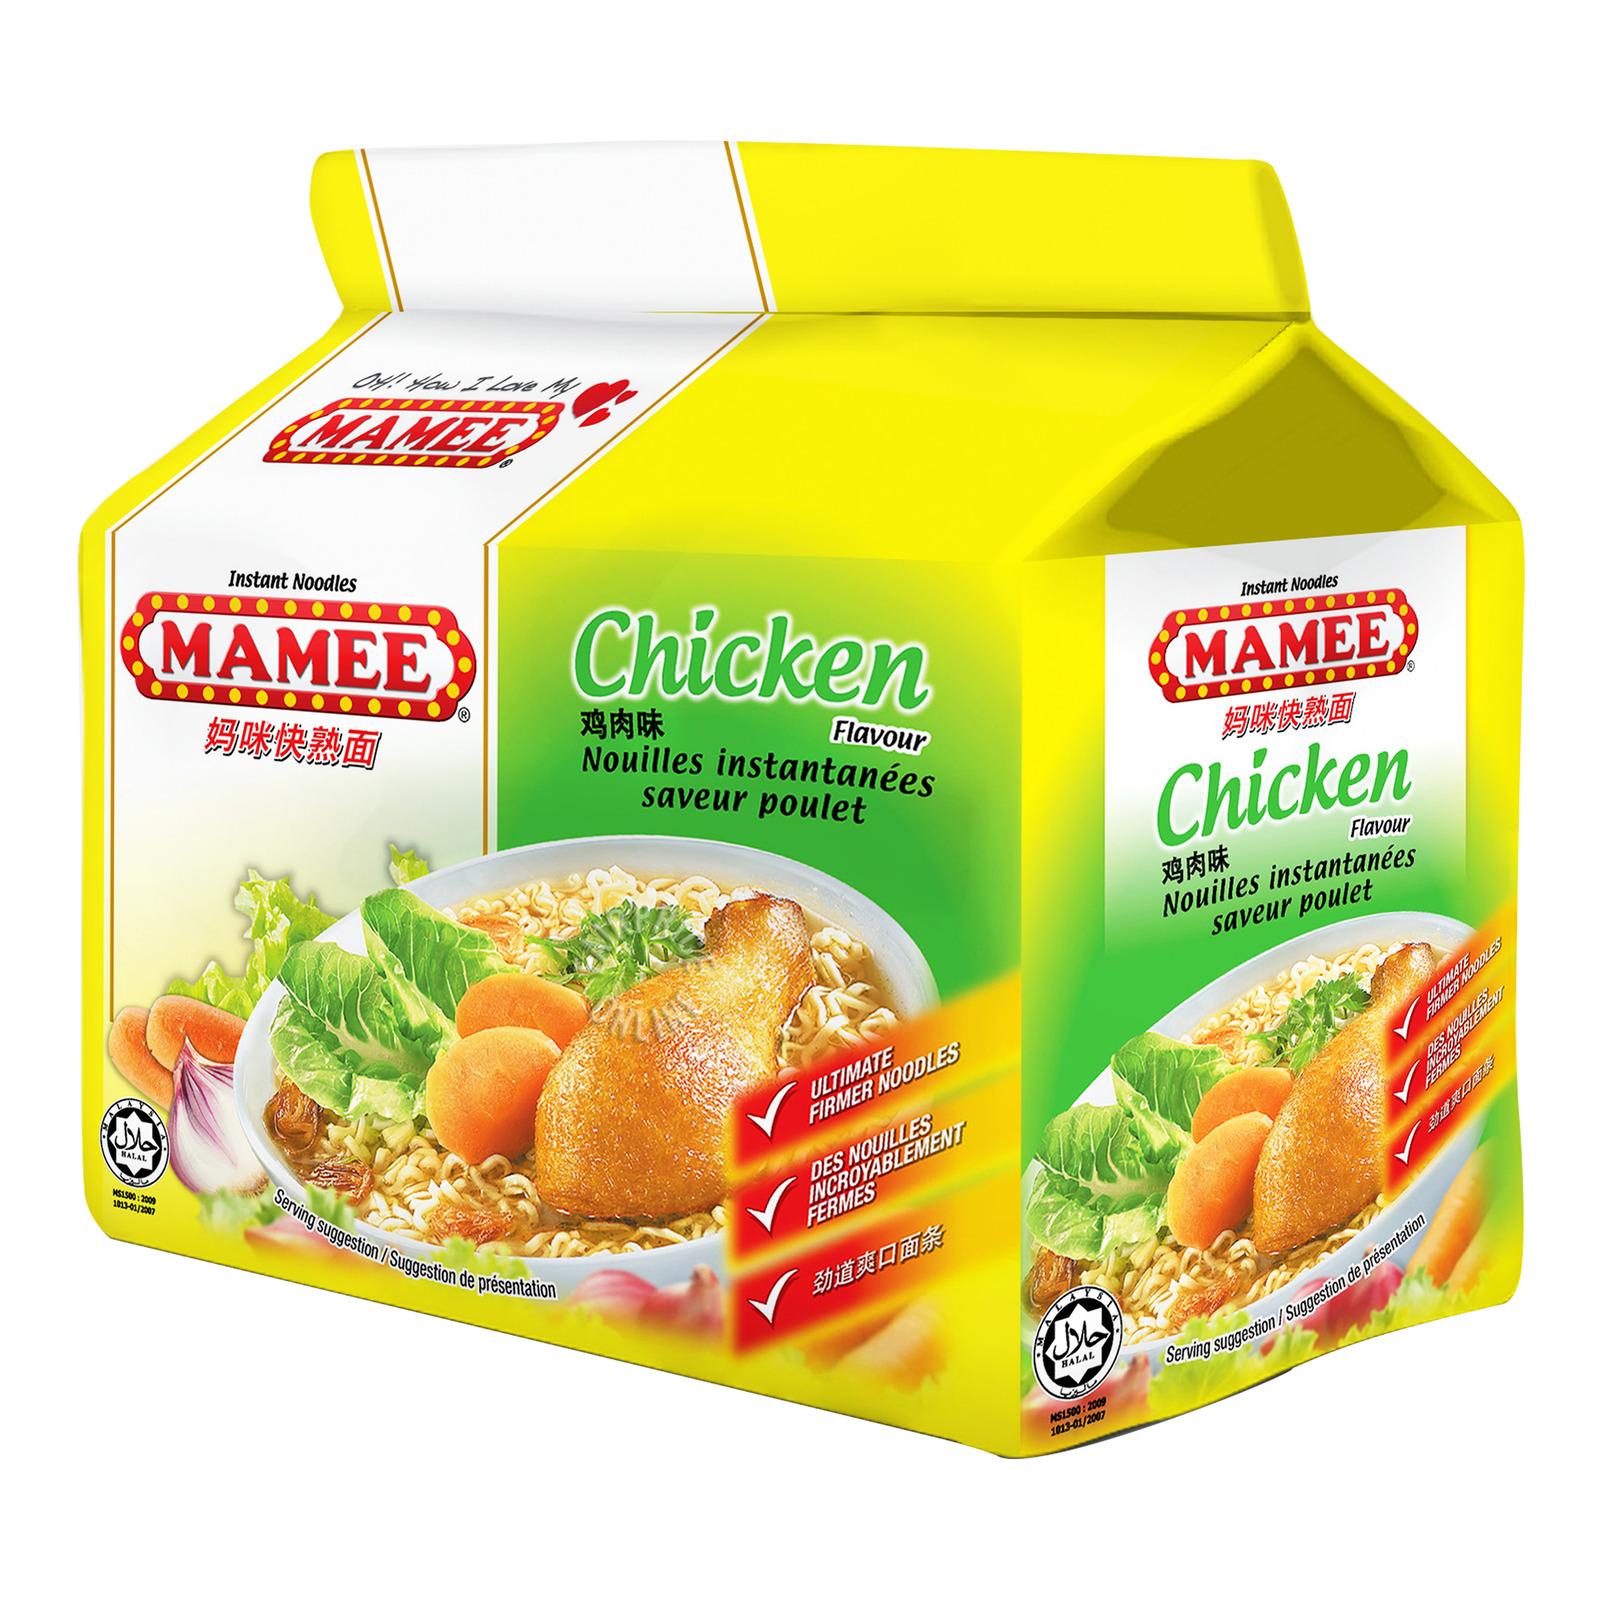 Mamee Instant Noodles - Chicken